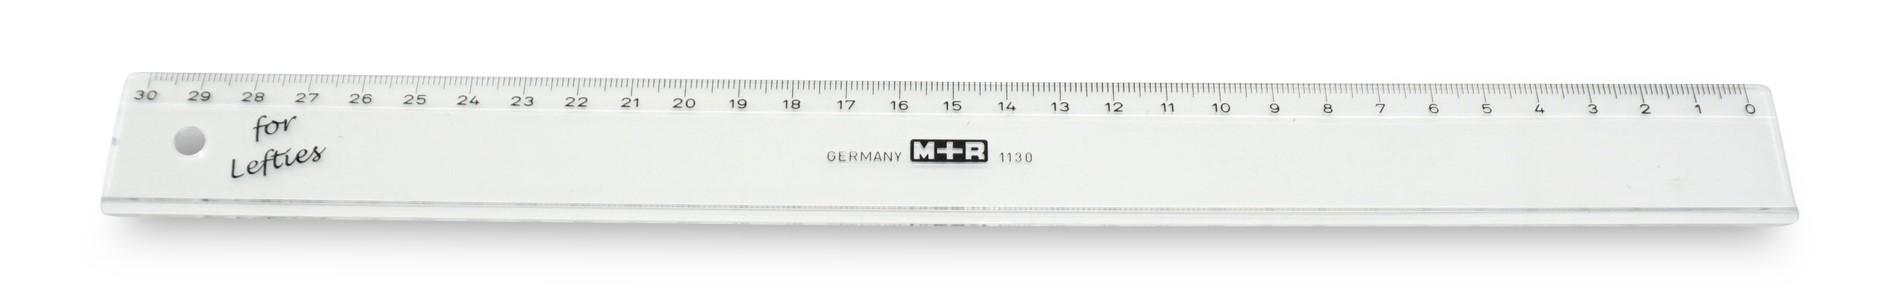 Möbius & Ruppert  Lineal für Linkshänder